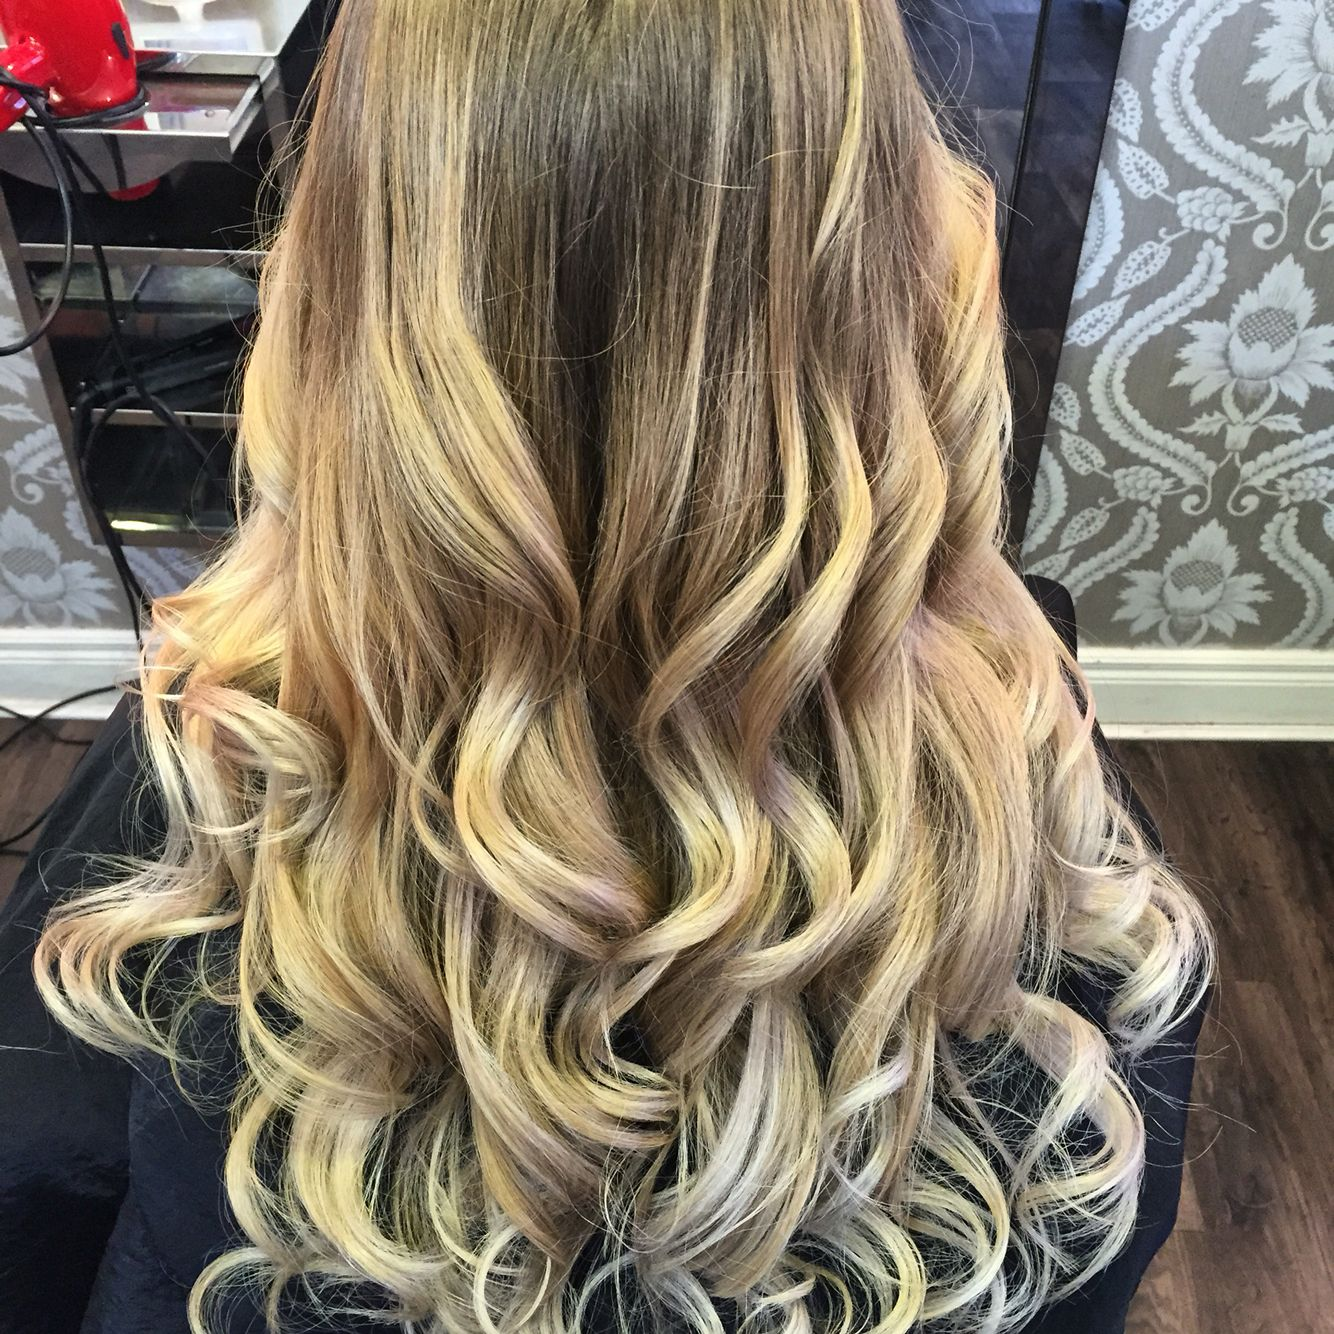 Ballayage Blond en ce qui concerne blonde ballayage | hairi <3 | pinterest | blondes